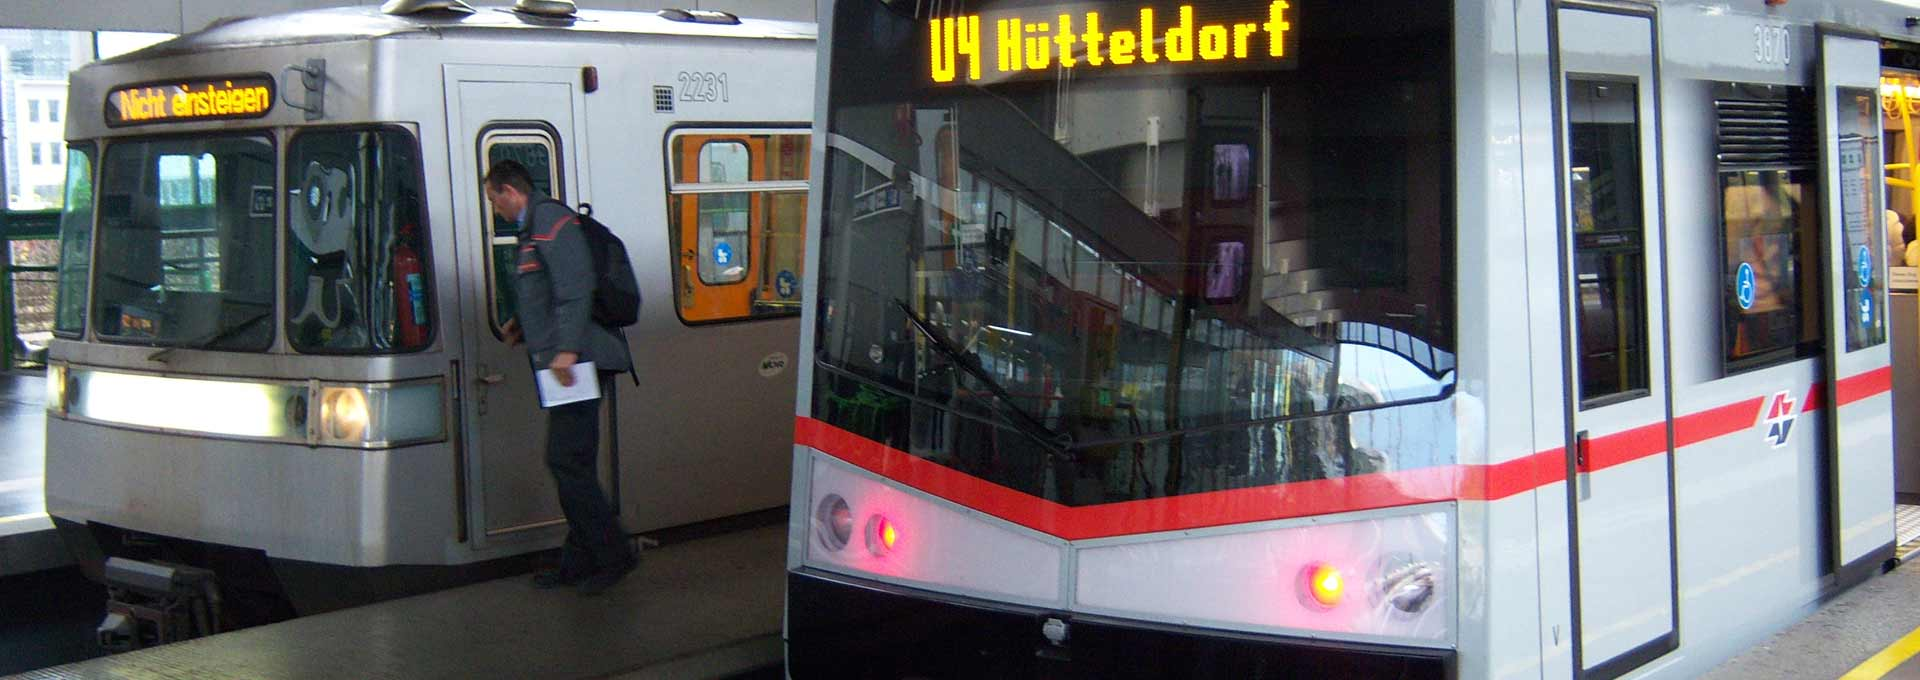 Using the Ubahn in Vienna Austria